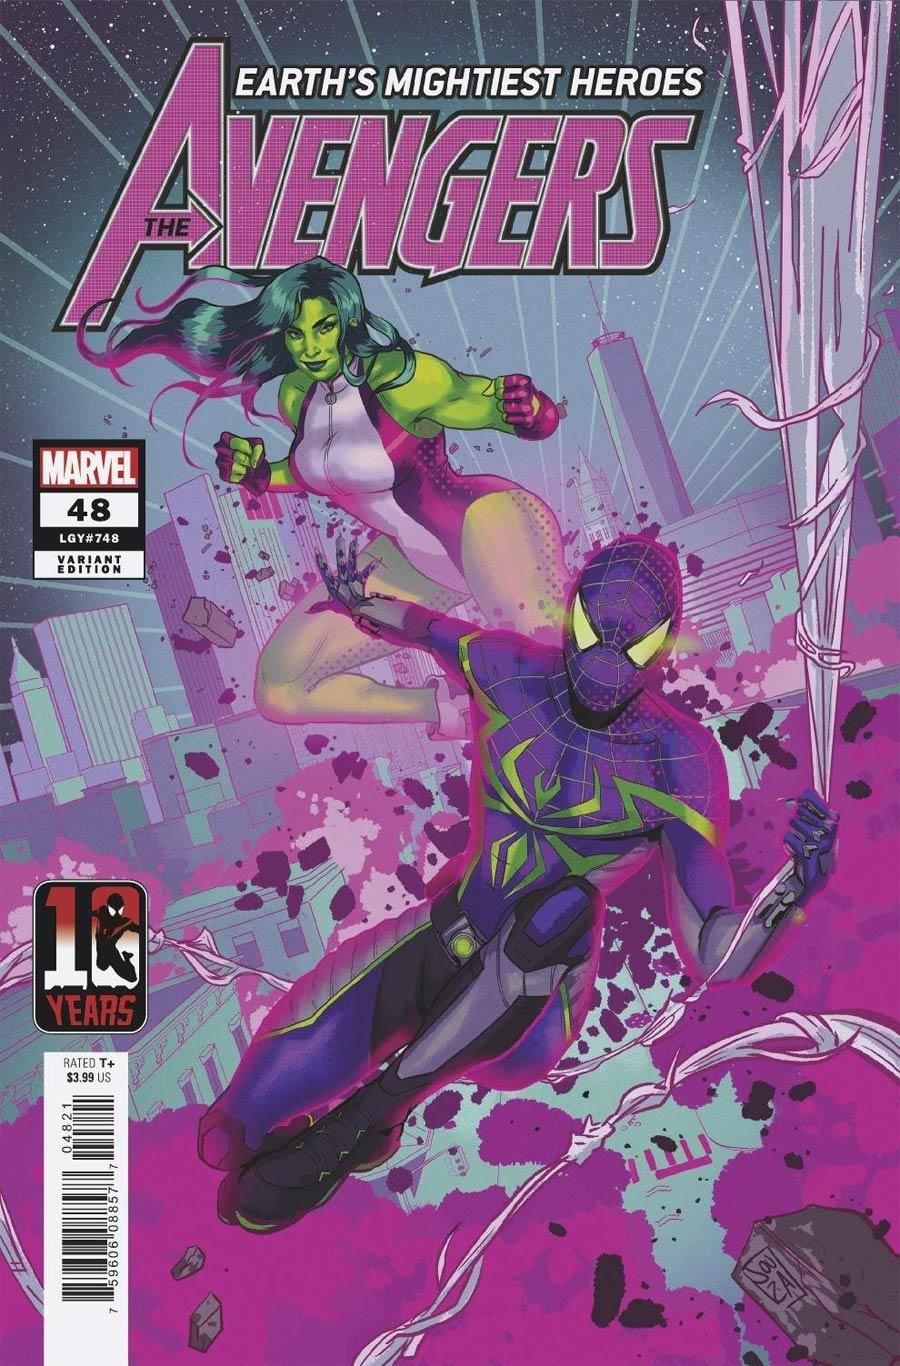 Avengers Vol 7 #48 Cover B Variant Ernanda Souza Miles Morales Spider-Man 10th Anniversary Cover